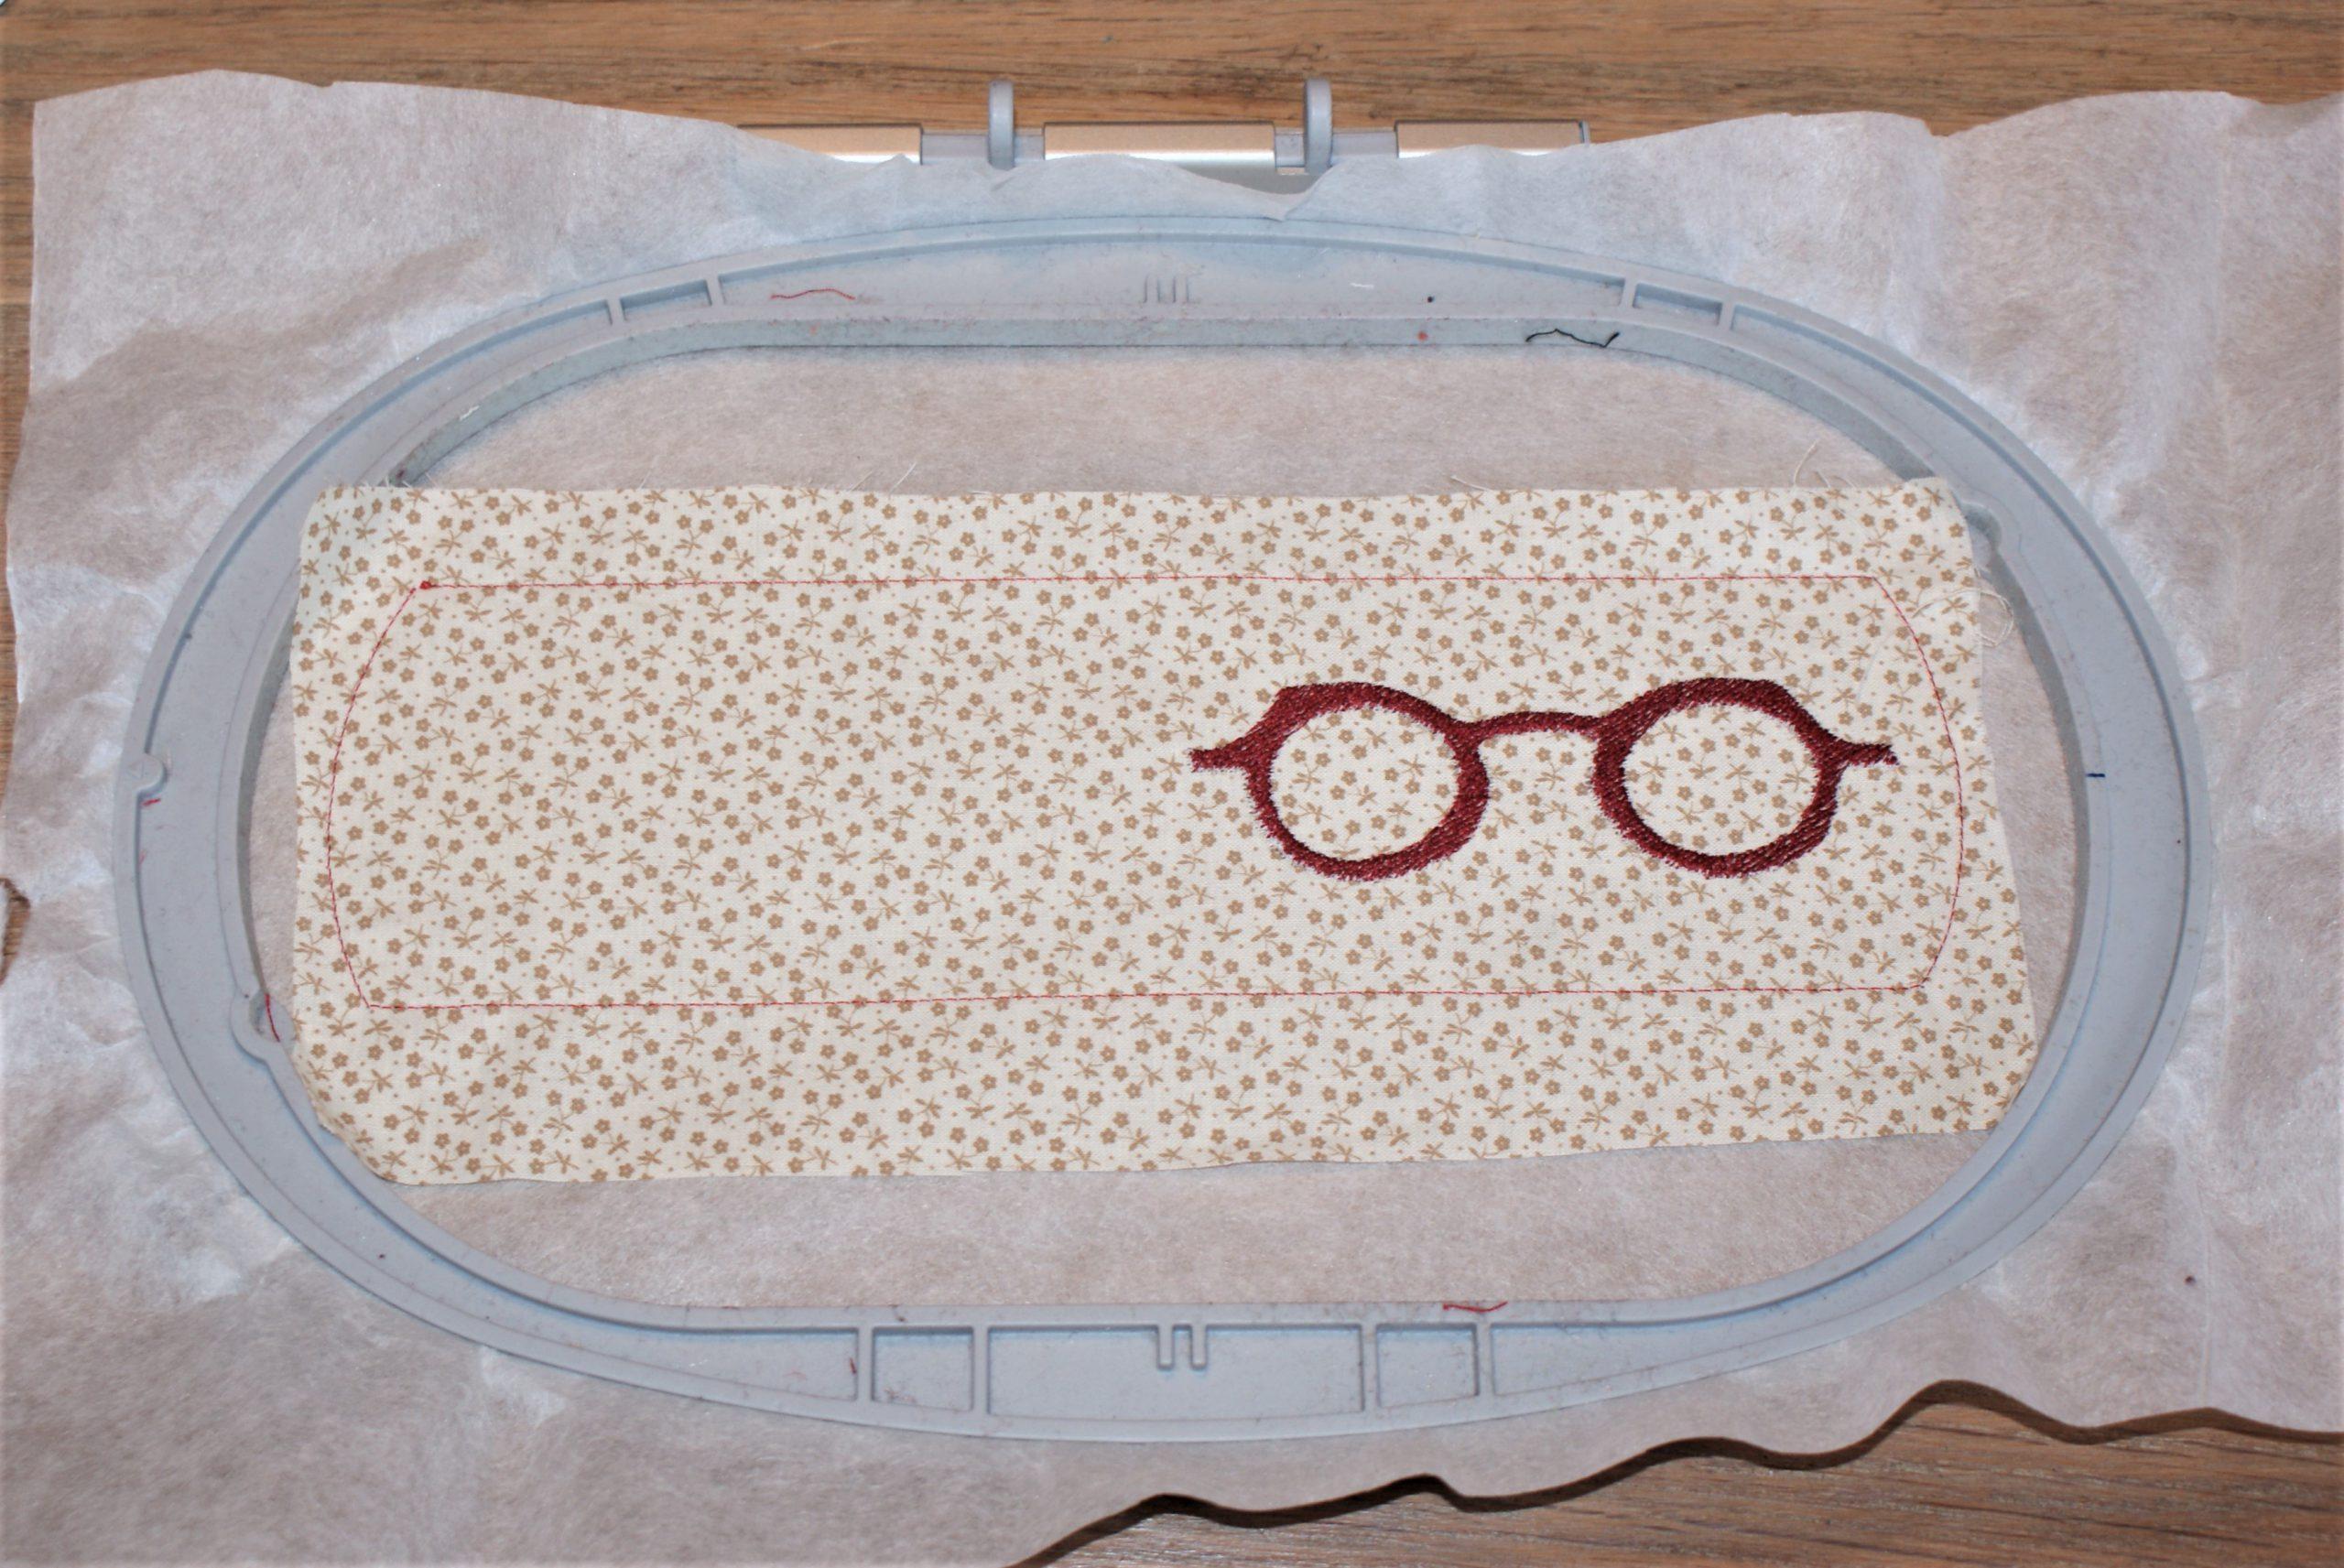 Borduur de bril op de brillenkoker.